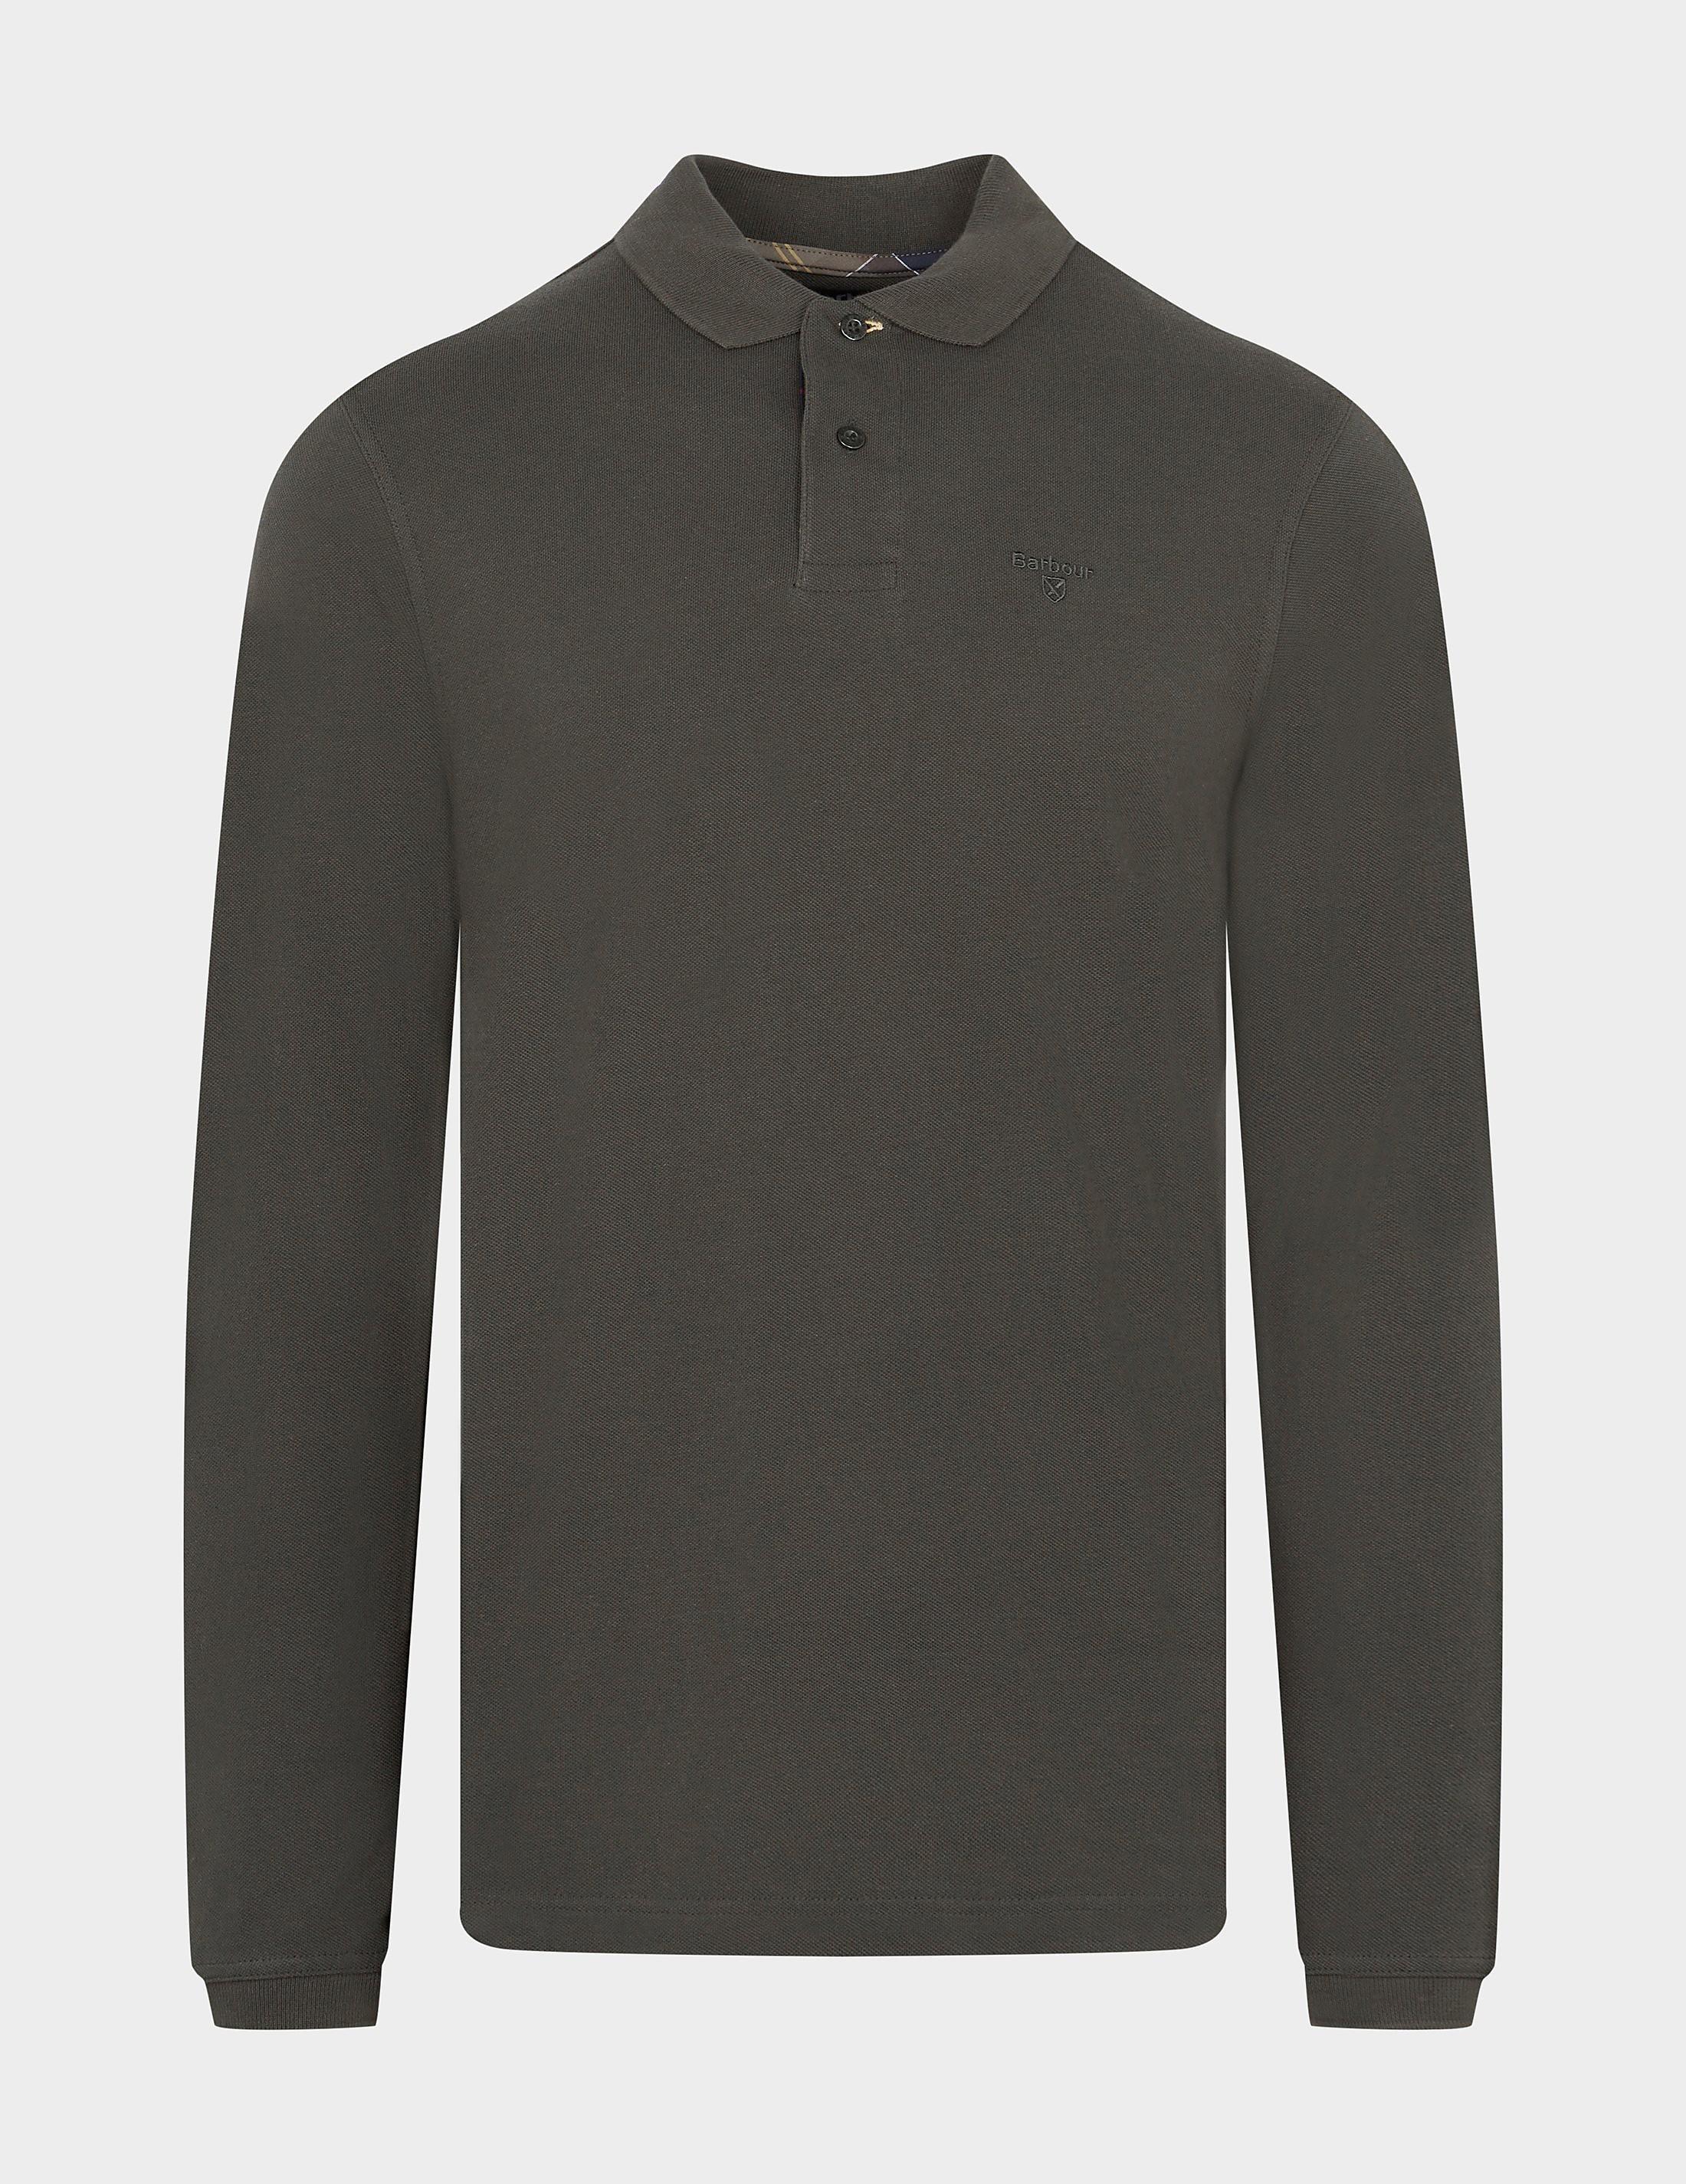 Barbour Long Sleeve Polo Shirt